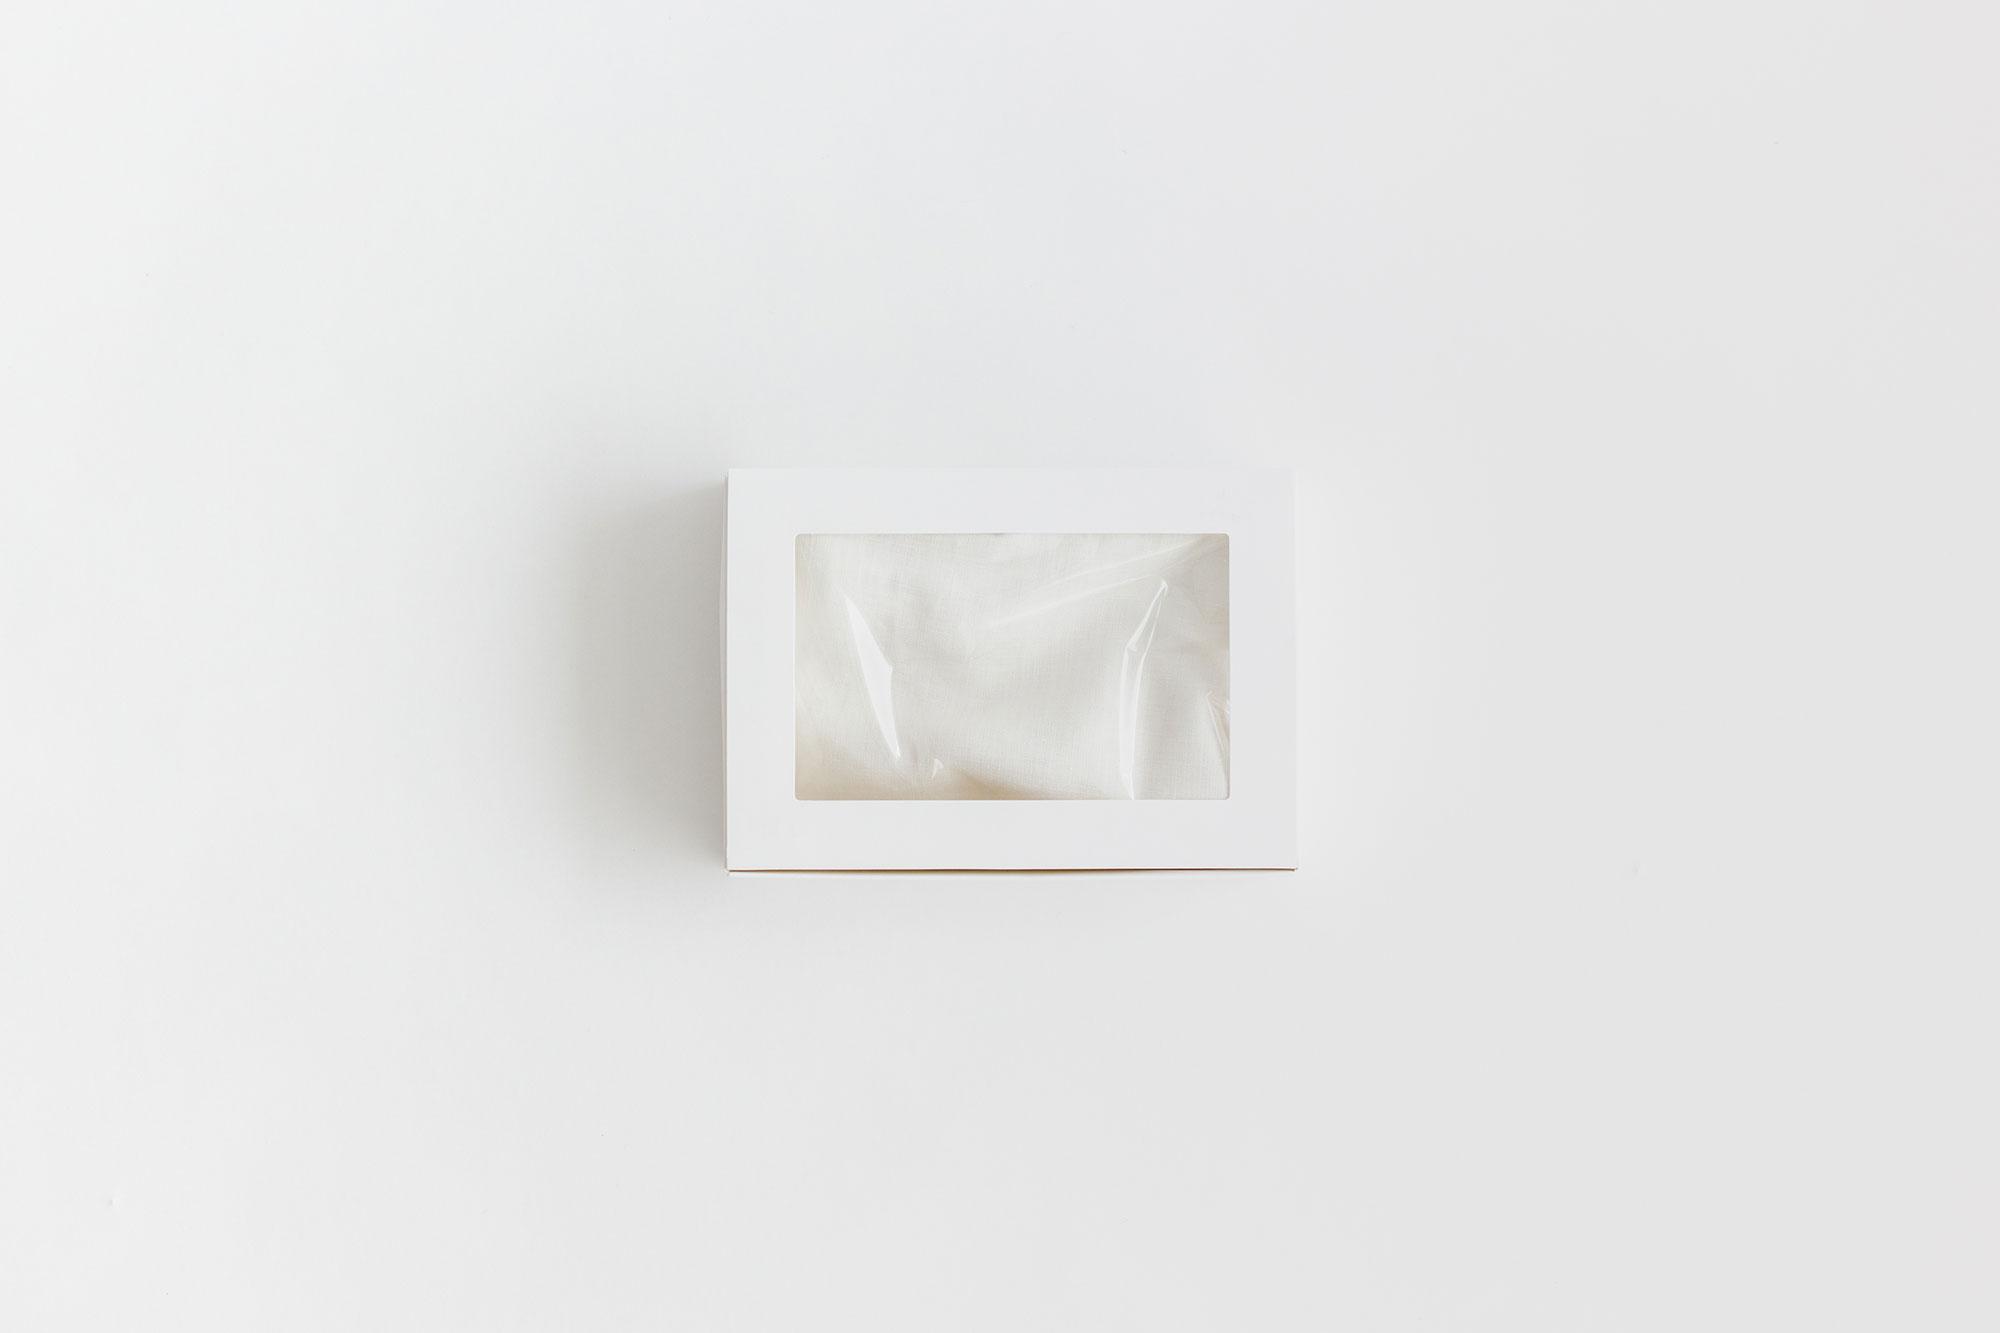 COCOFA 塩まくら